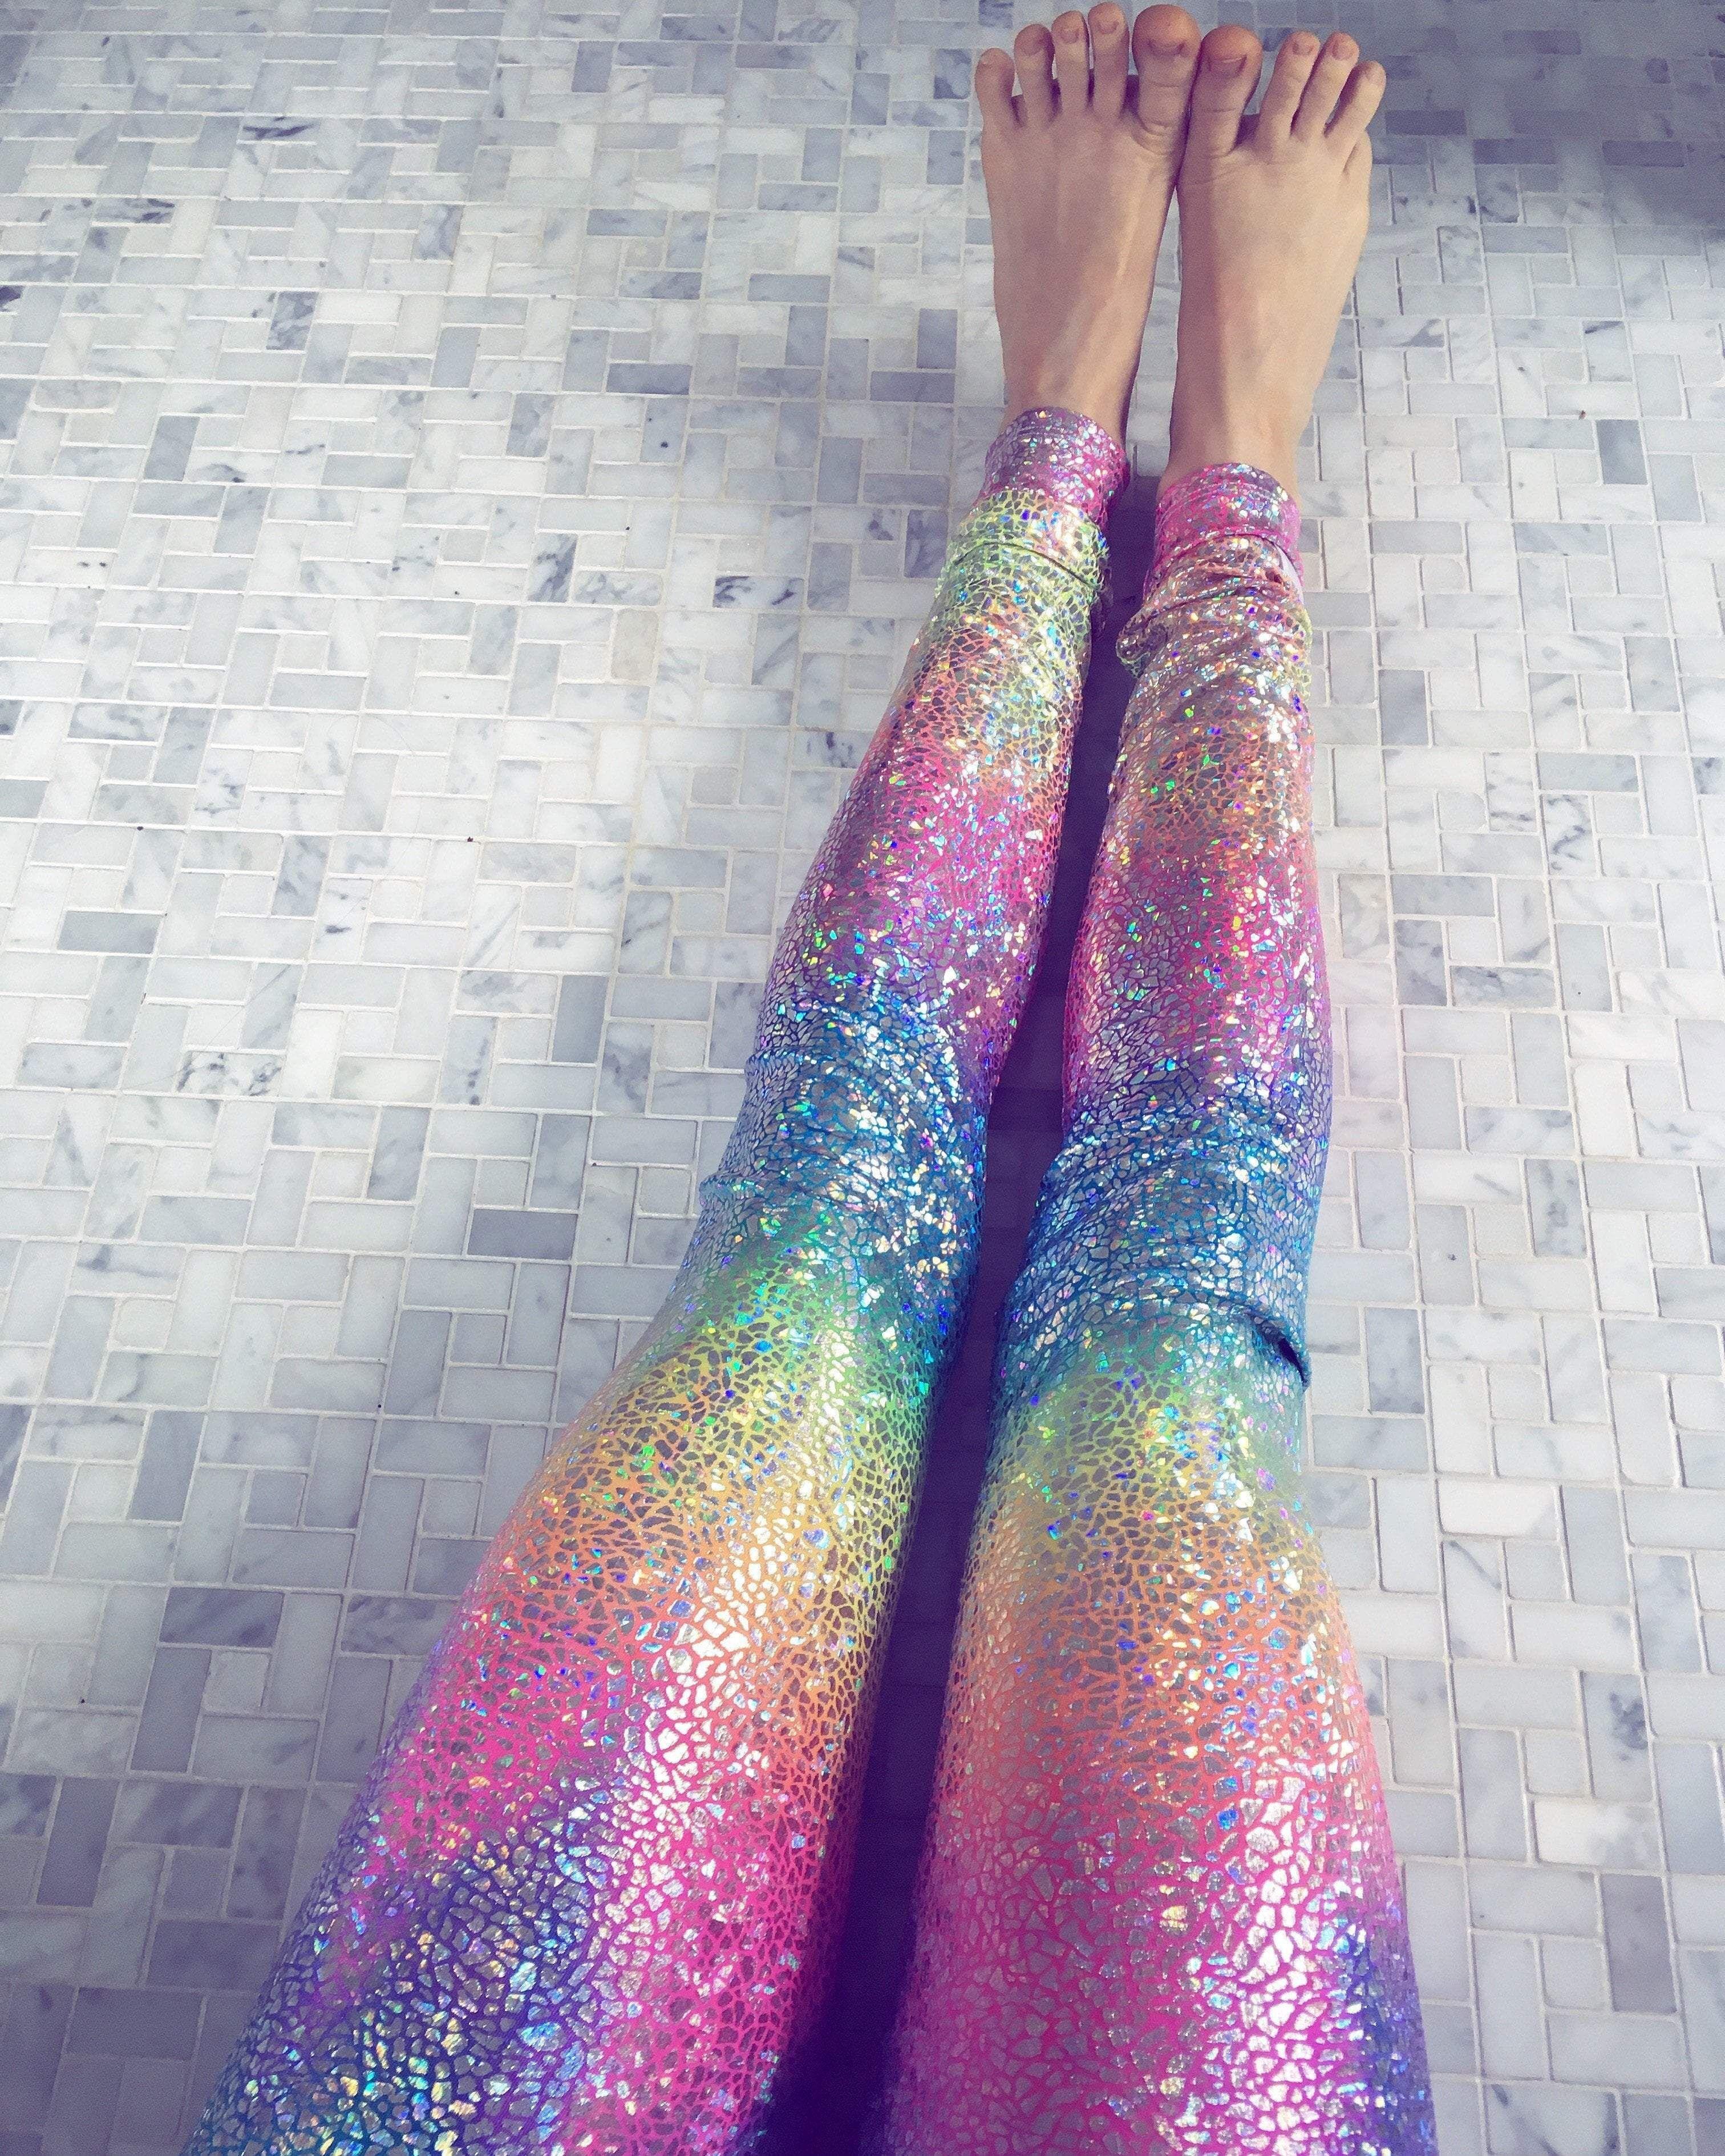 122bd48800d7c Ocean rainbow sparkle leggings | leggings | Sparkly leggings, Yoga ...